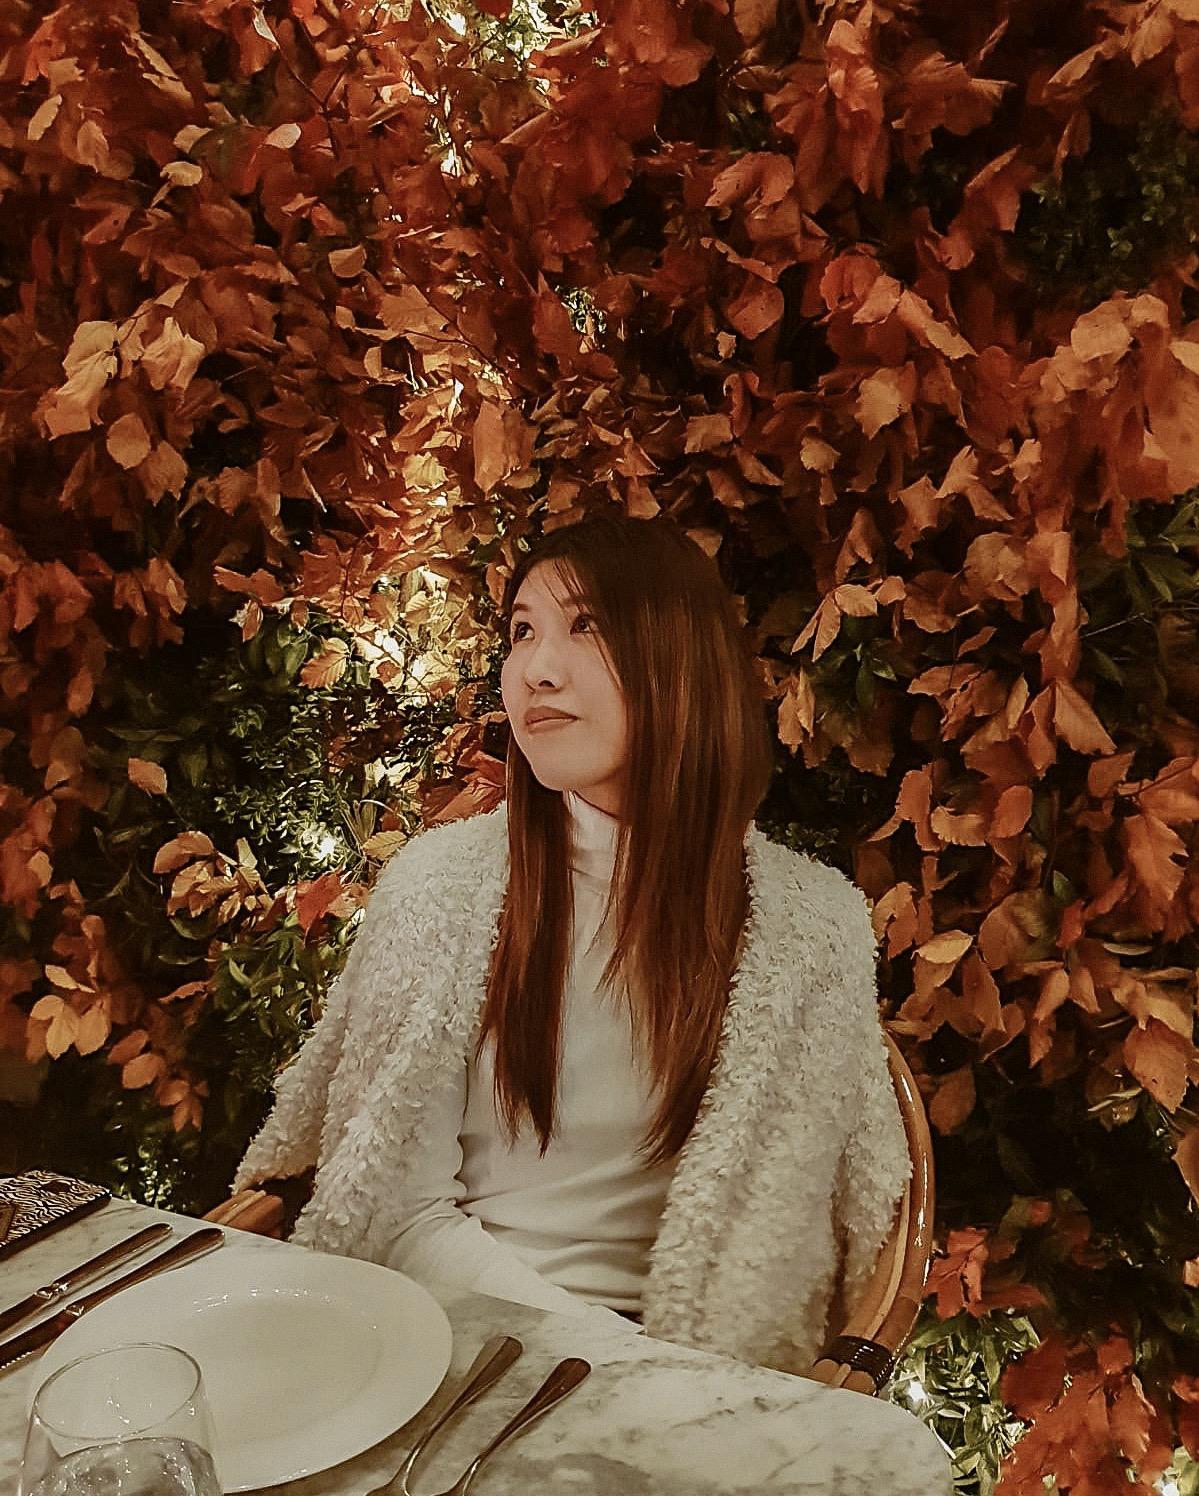 Dalloway Terrace – An Autumn Dream